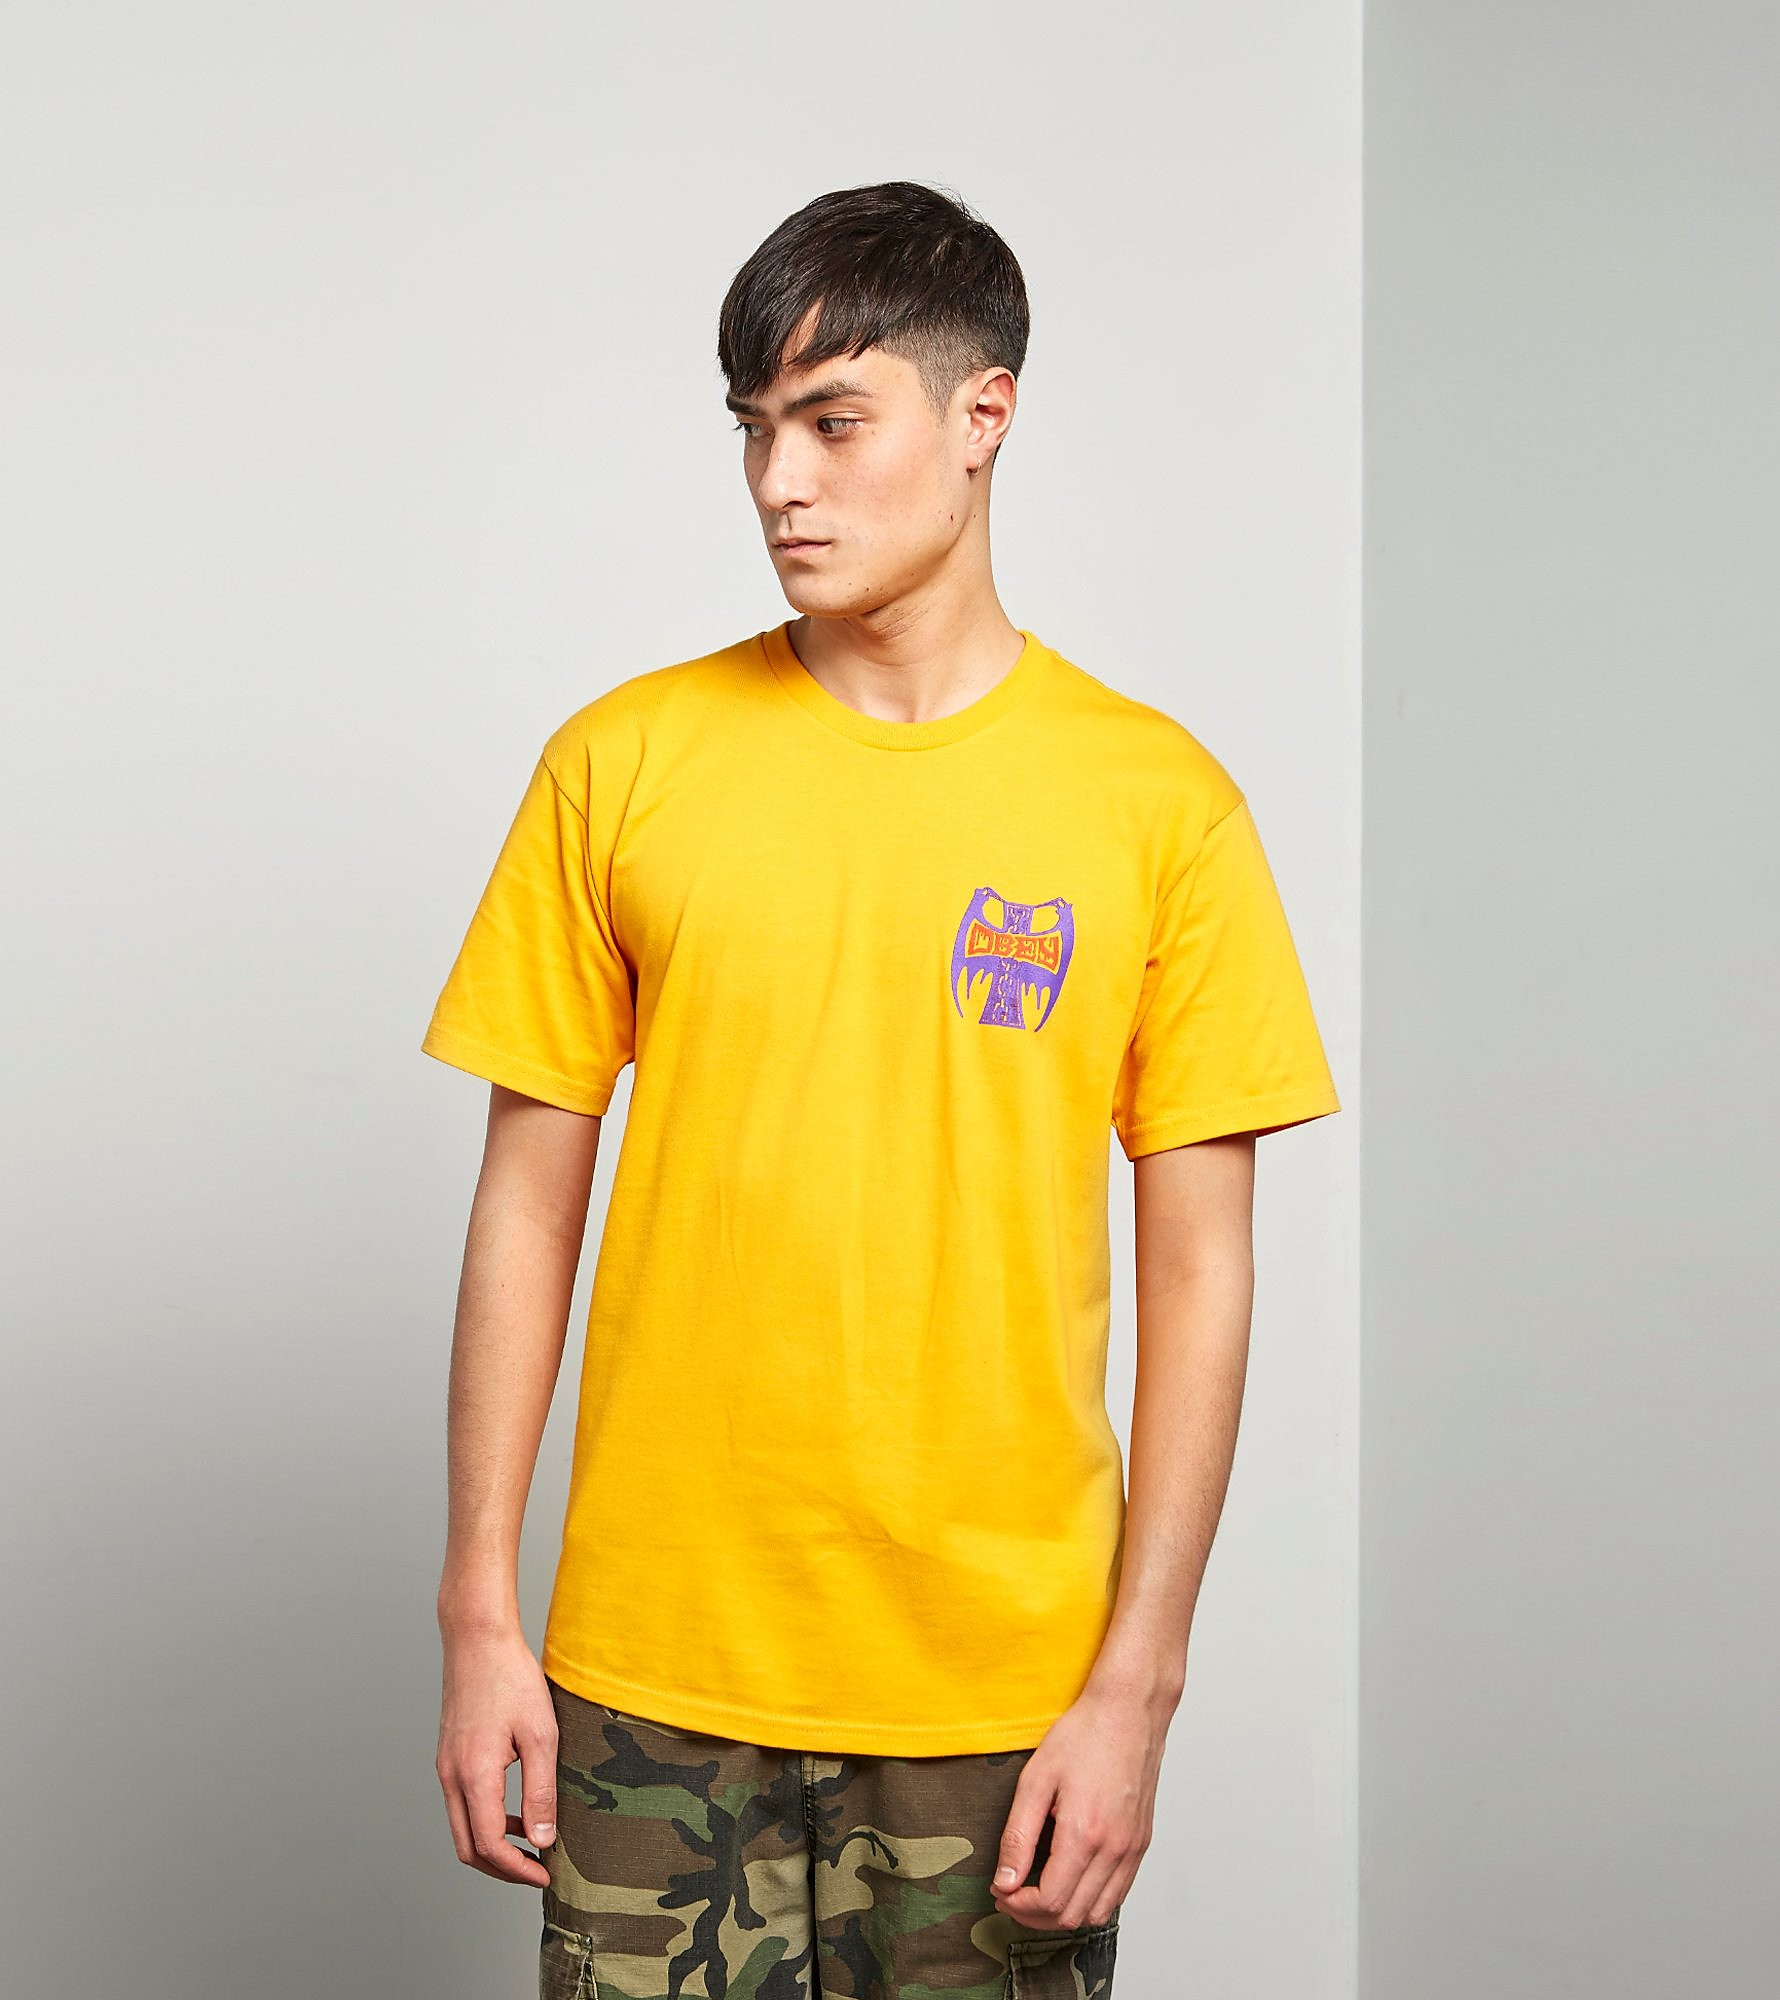 Obey Grim Cross T-Shirt